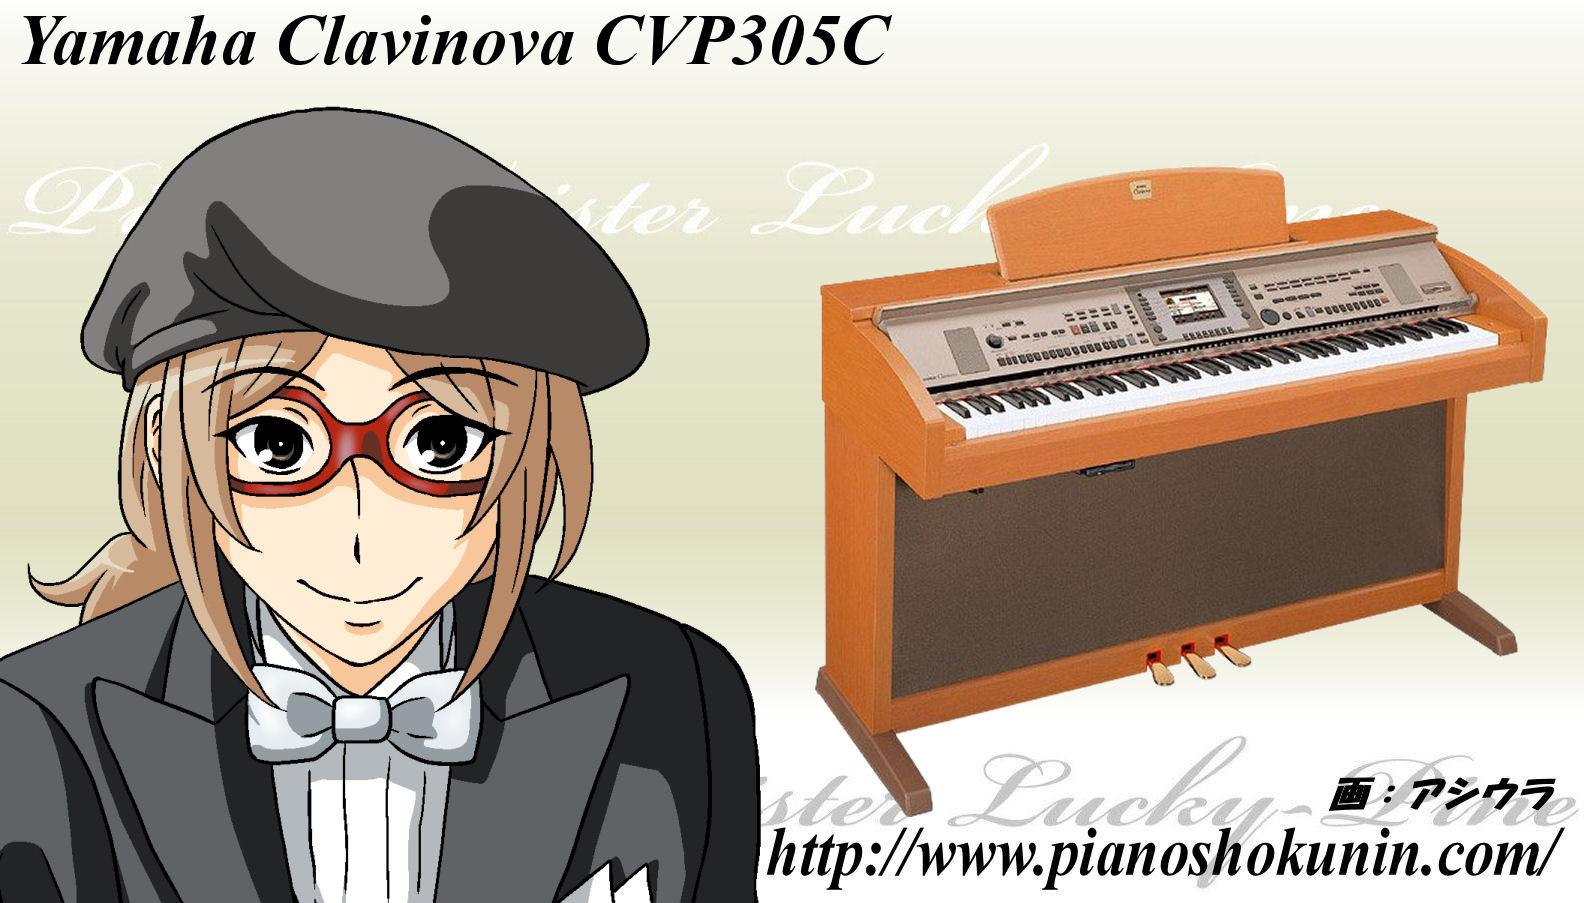 Yamaha CVP305C